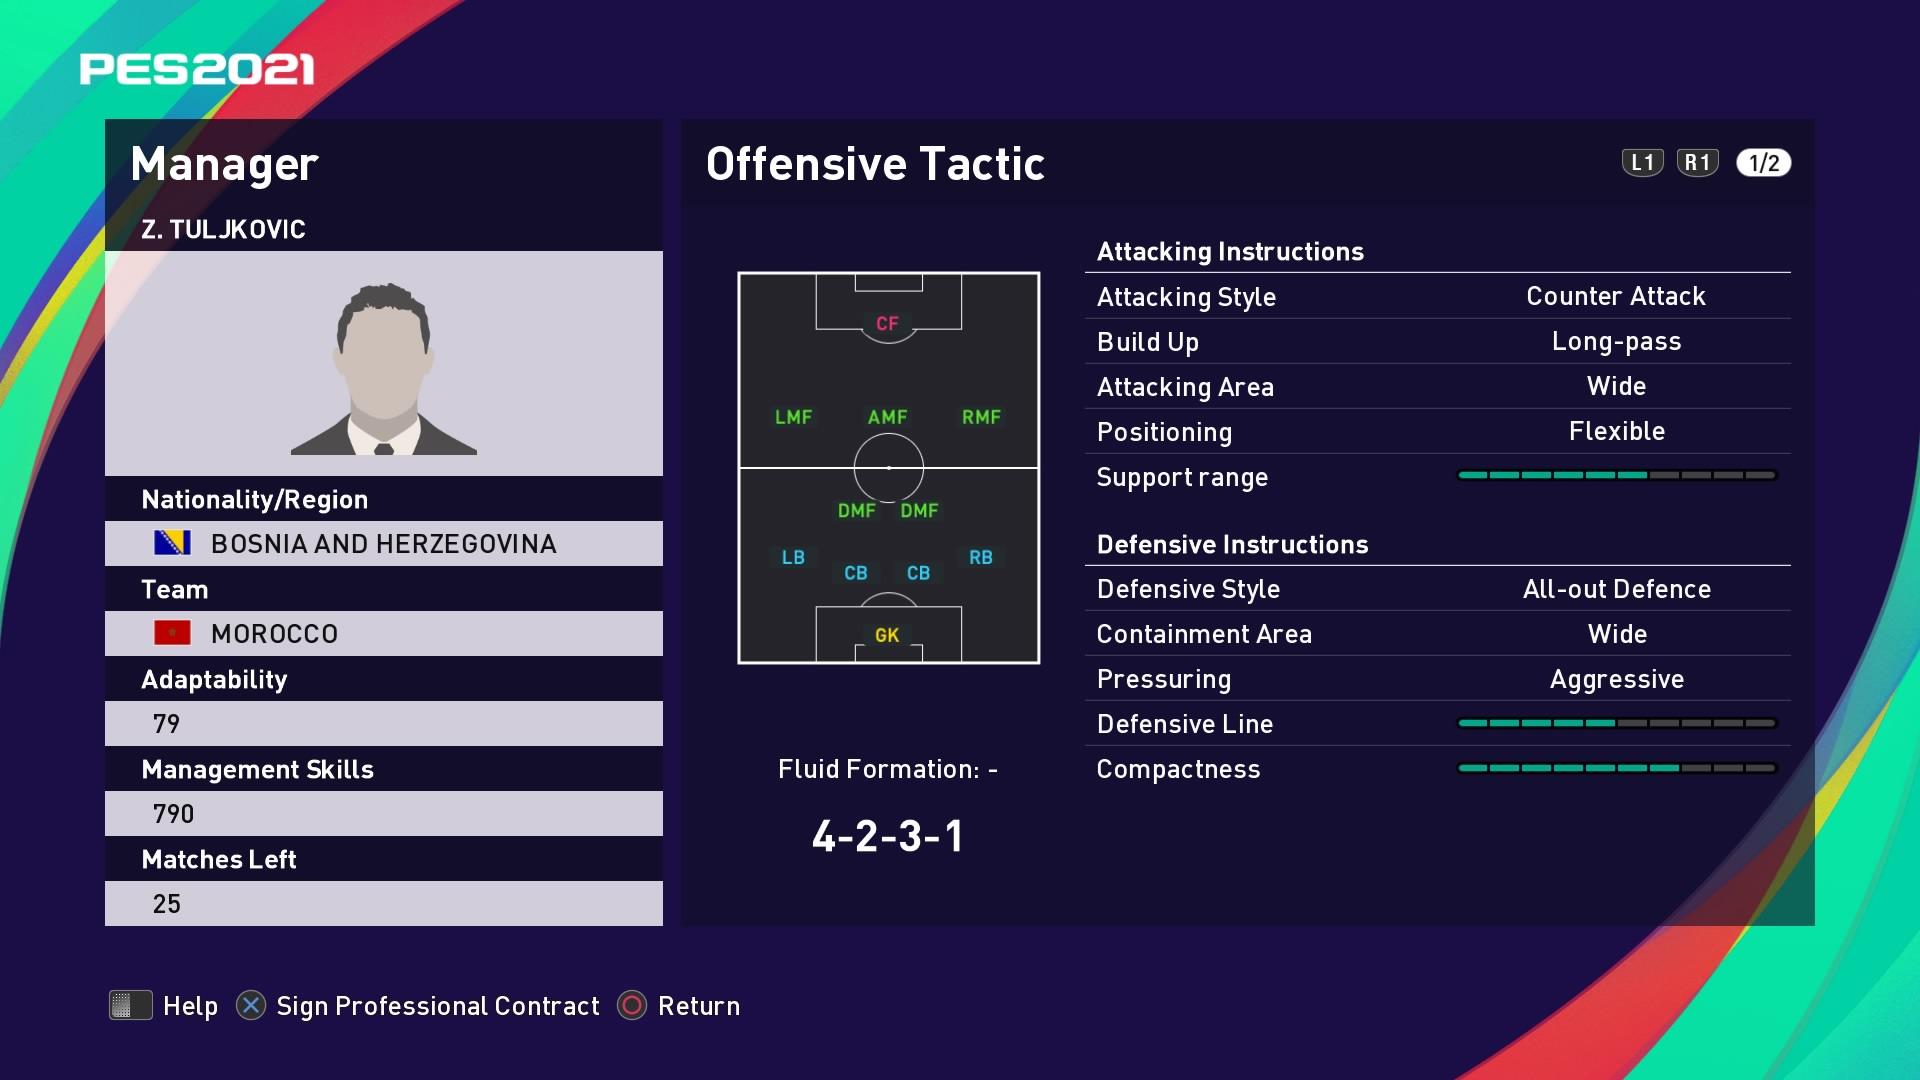 Z. Tuljkovic (Vahid Halilhodžić) Offensive Tactic in PES 2021 myClub